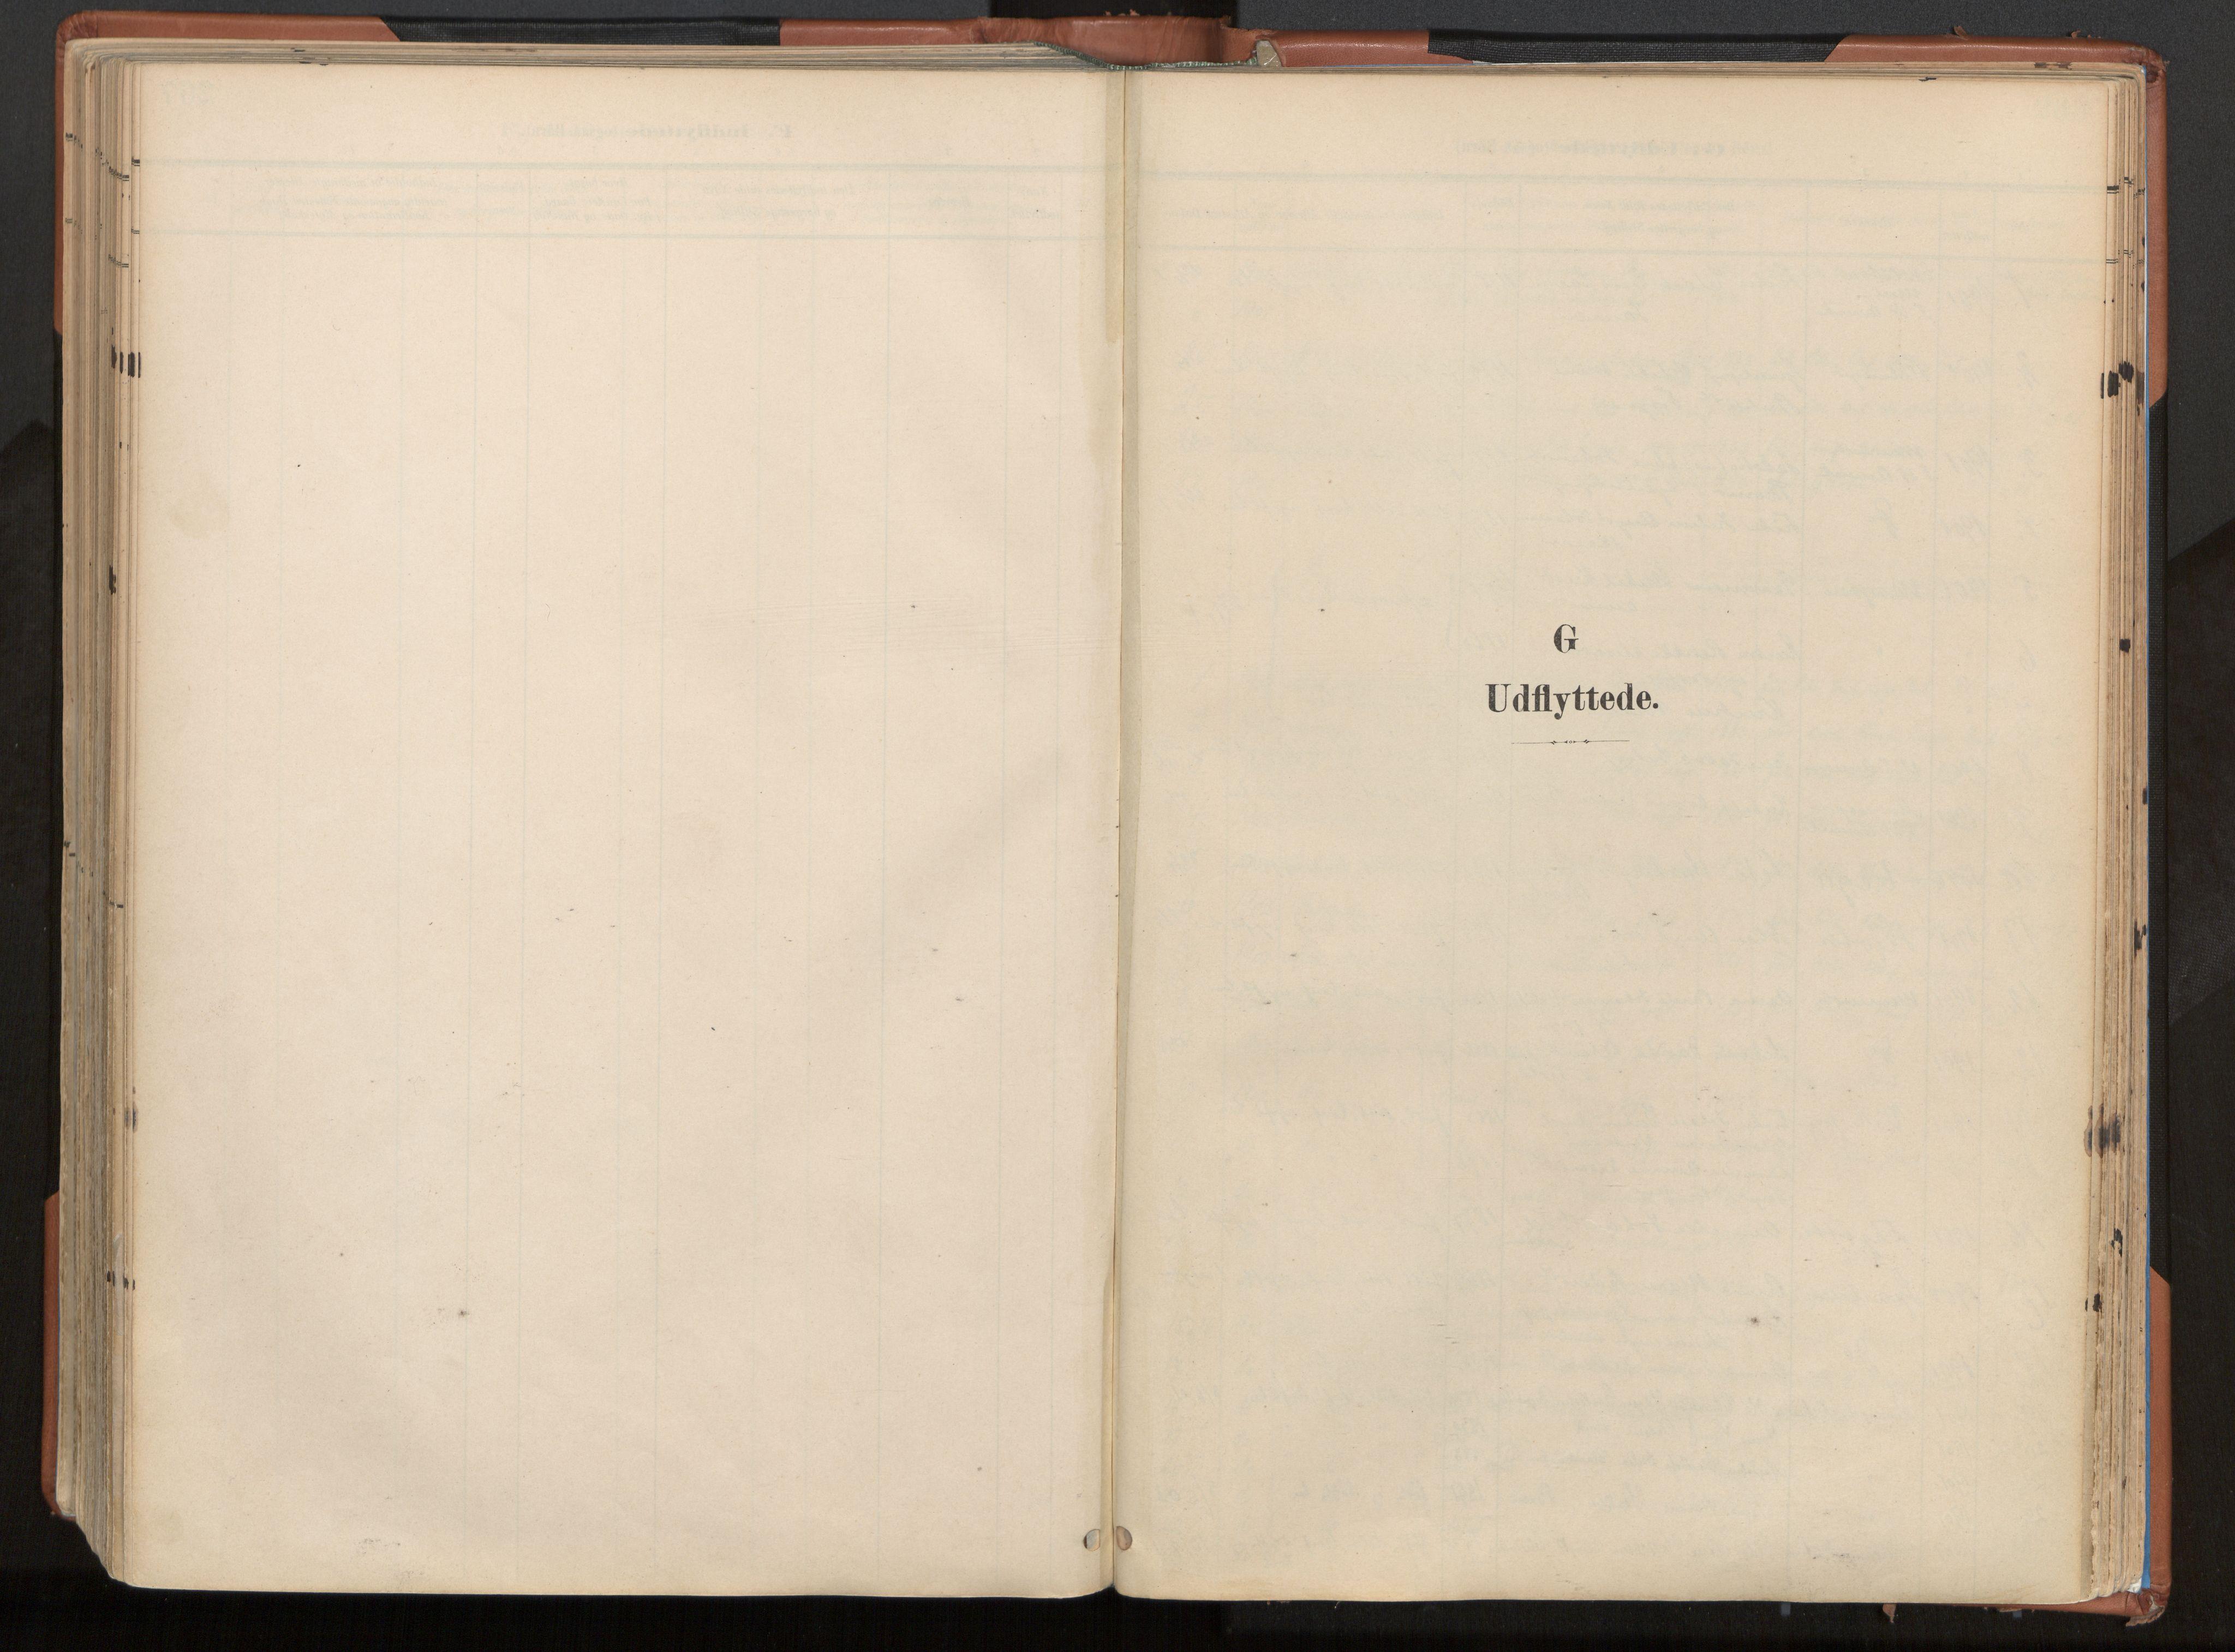 SAT, Ministerialprotokoller, klokkerbøker og fødselsregistre - Nordland, 813/L0201: Ministerialbok nr. 813A11, 1901-1918